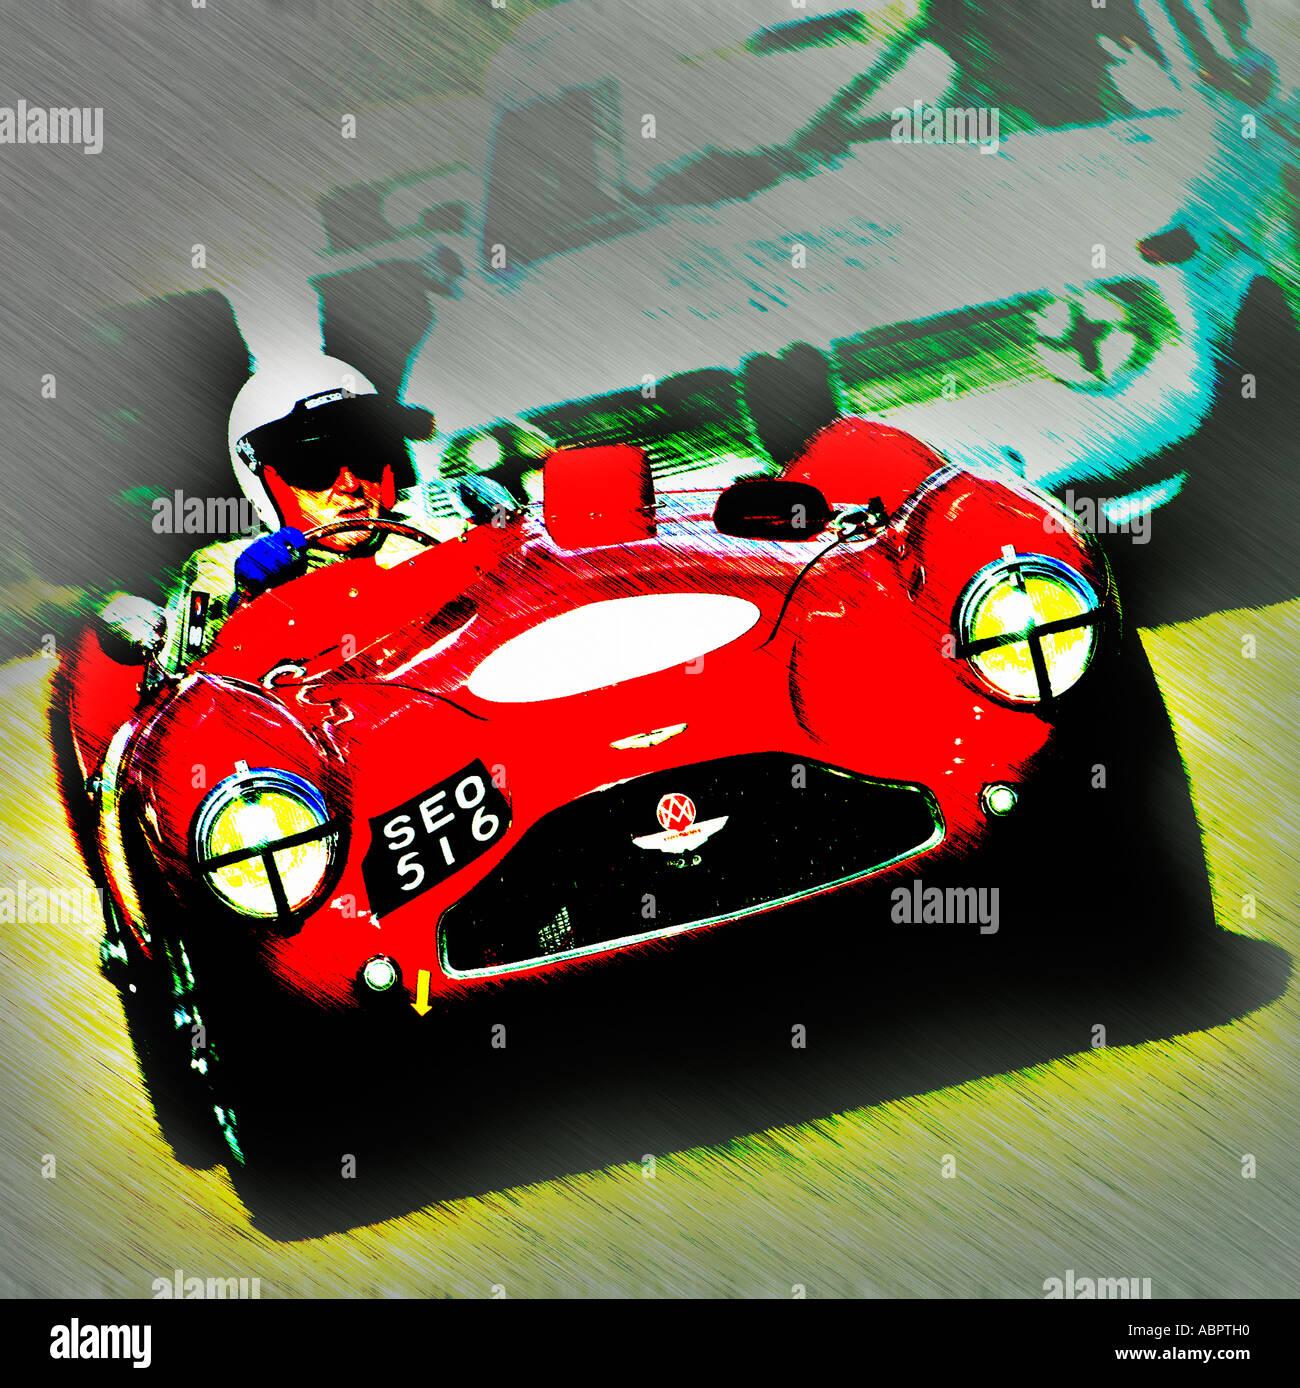 Aston Martin DB3S roten Sportwagen Konzept Bild. Stockbild